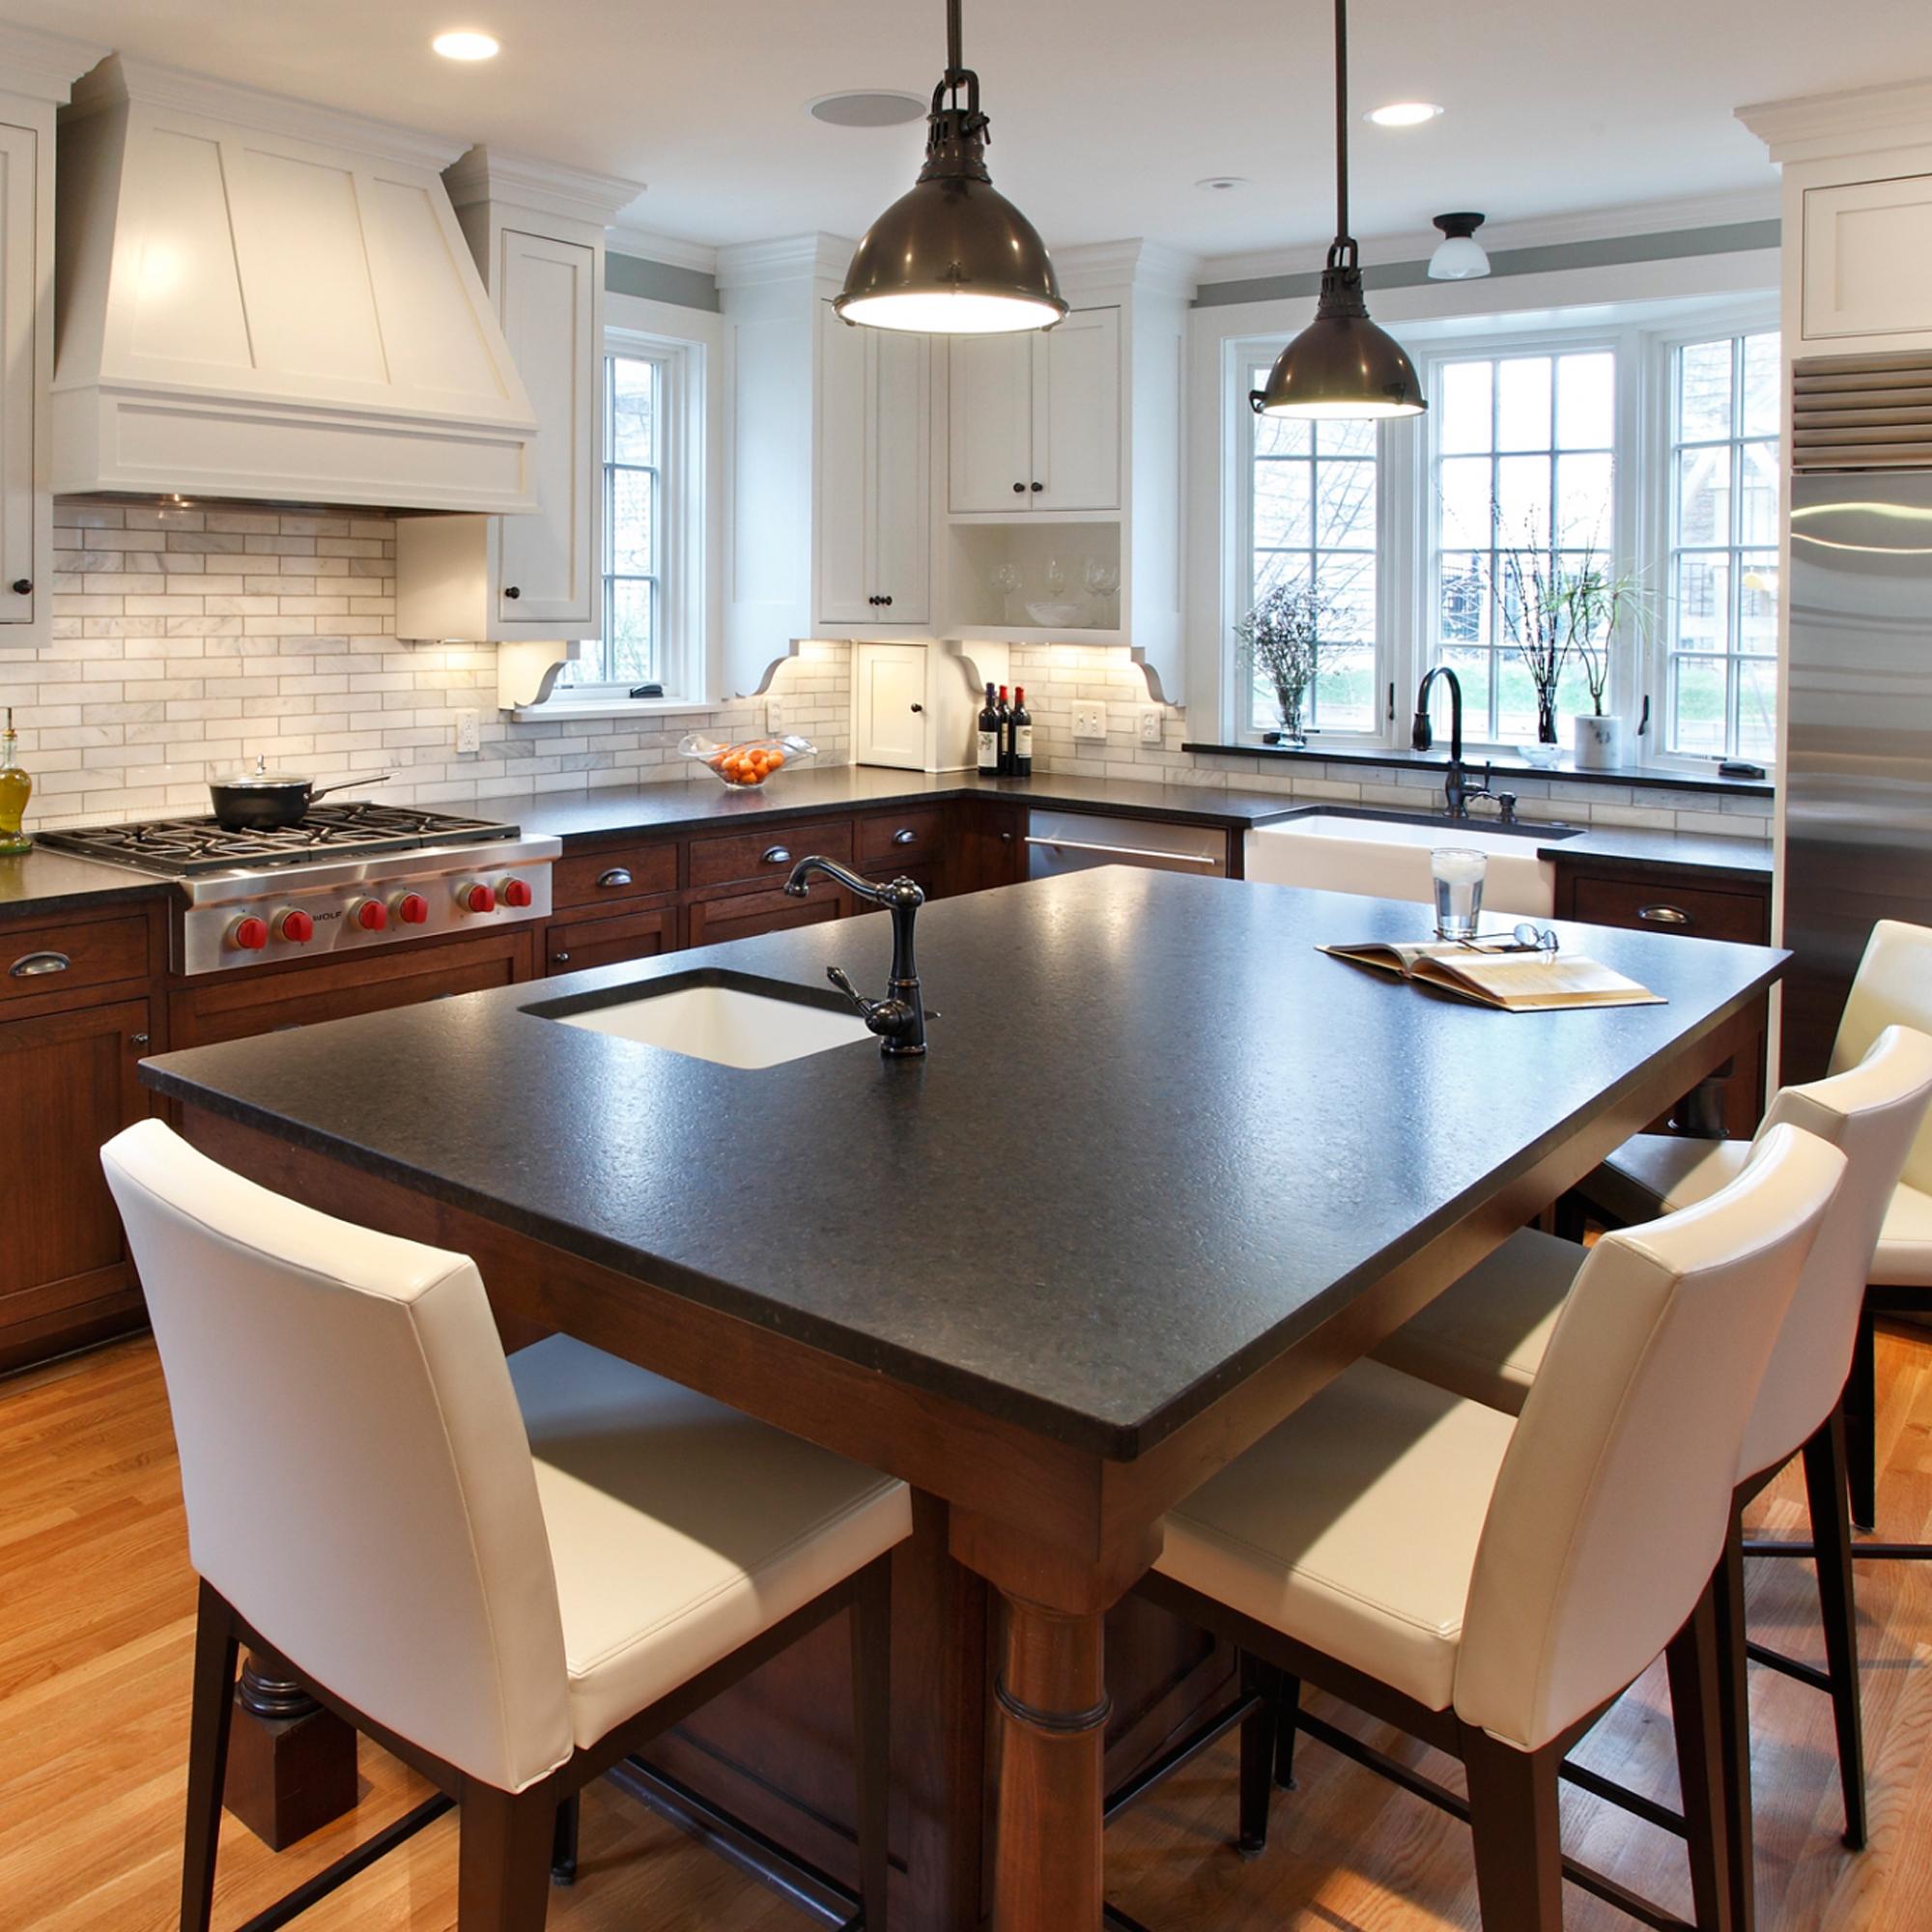 Кухонный стол посередине